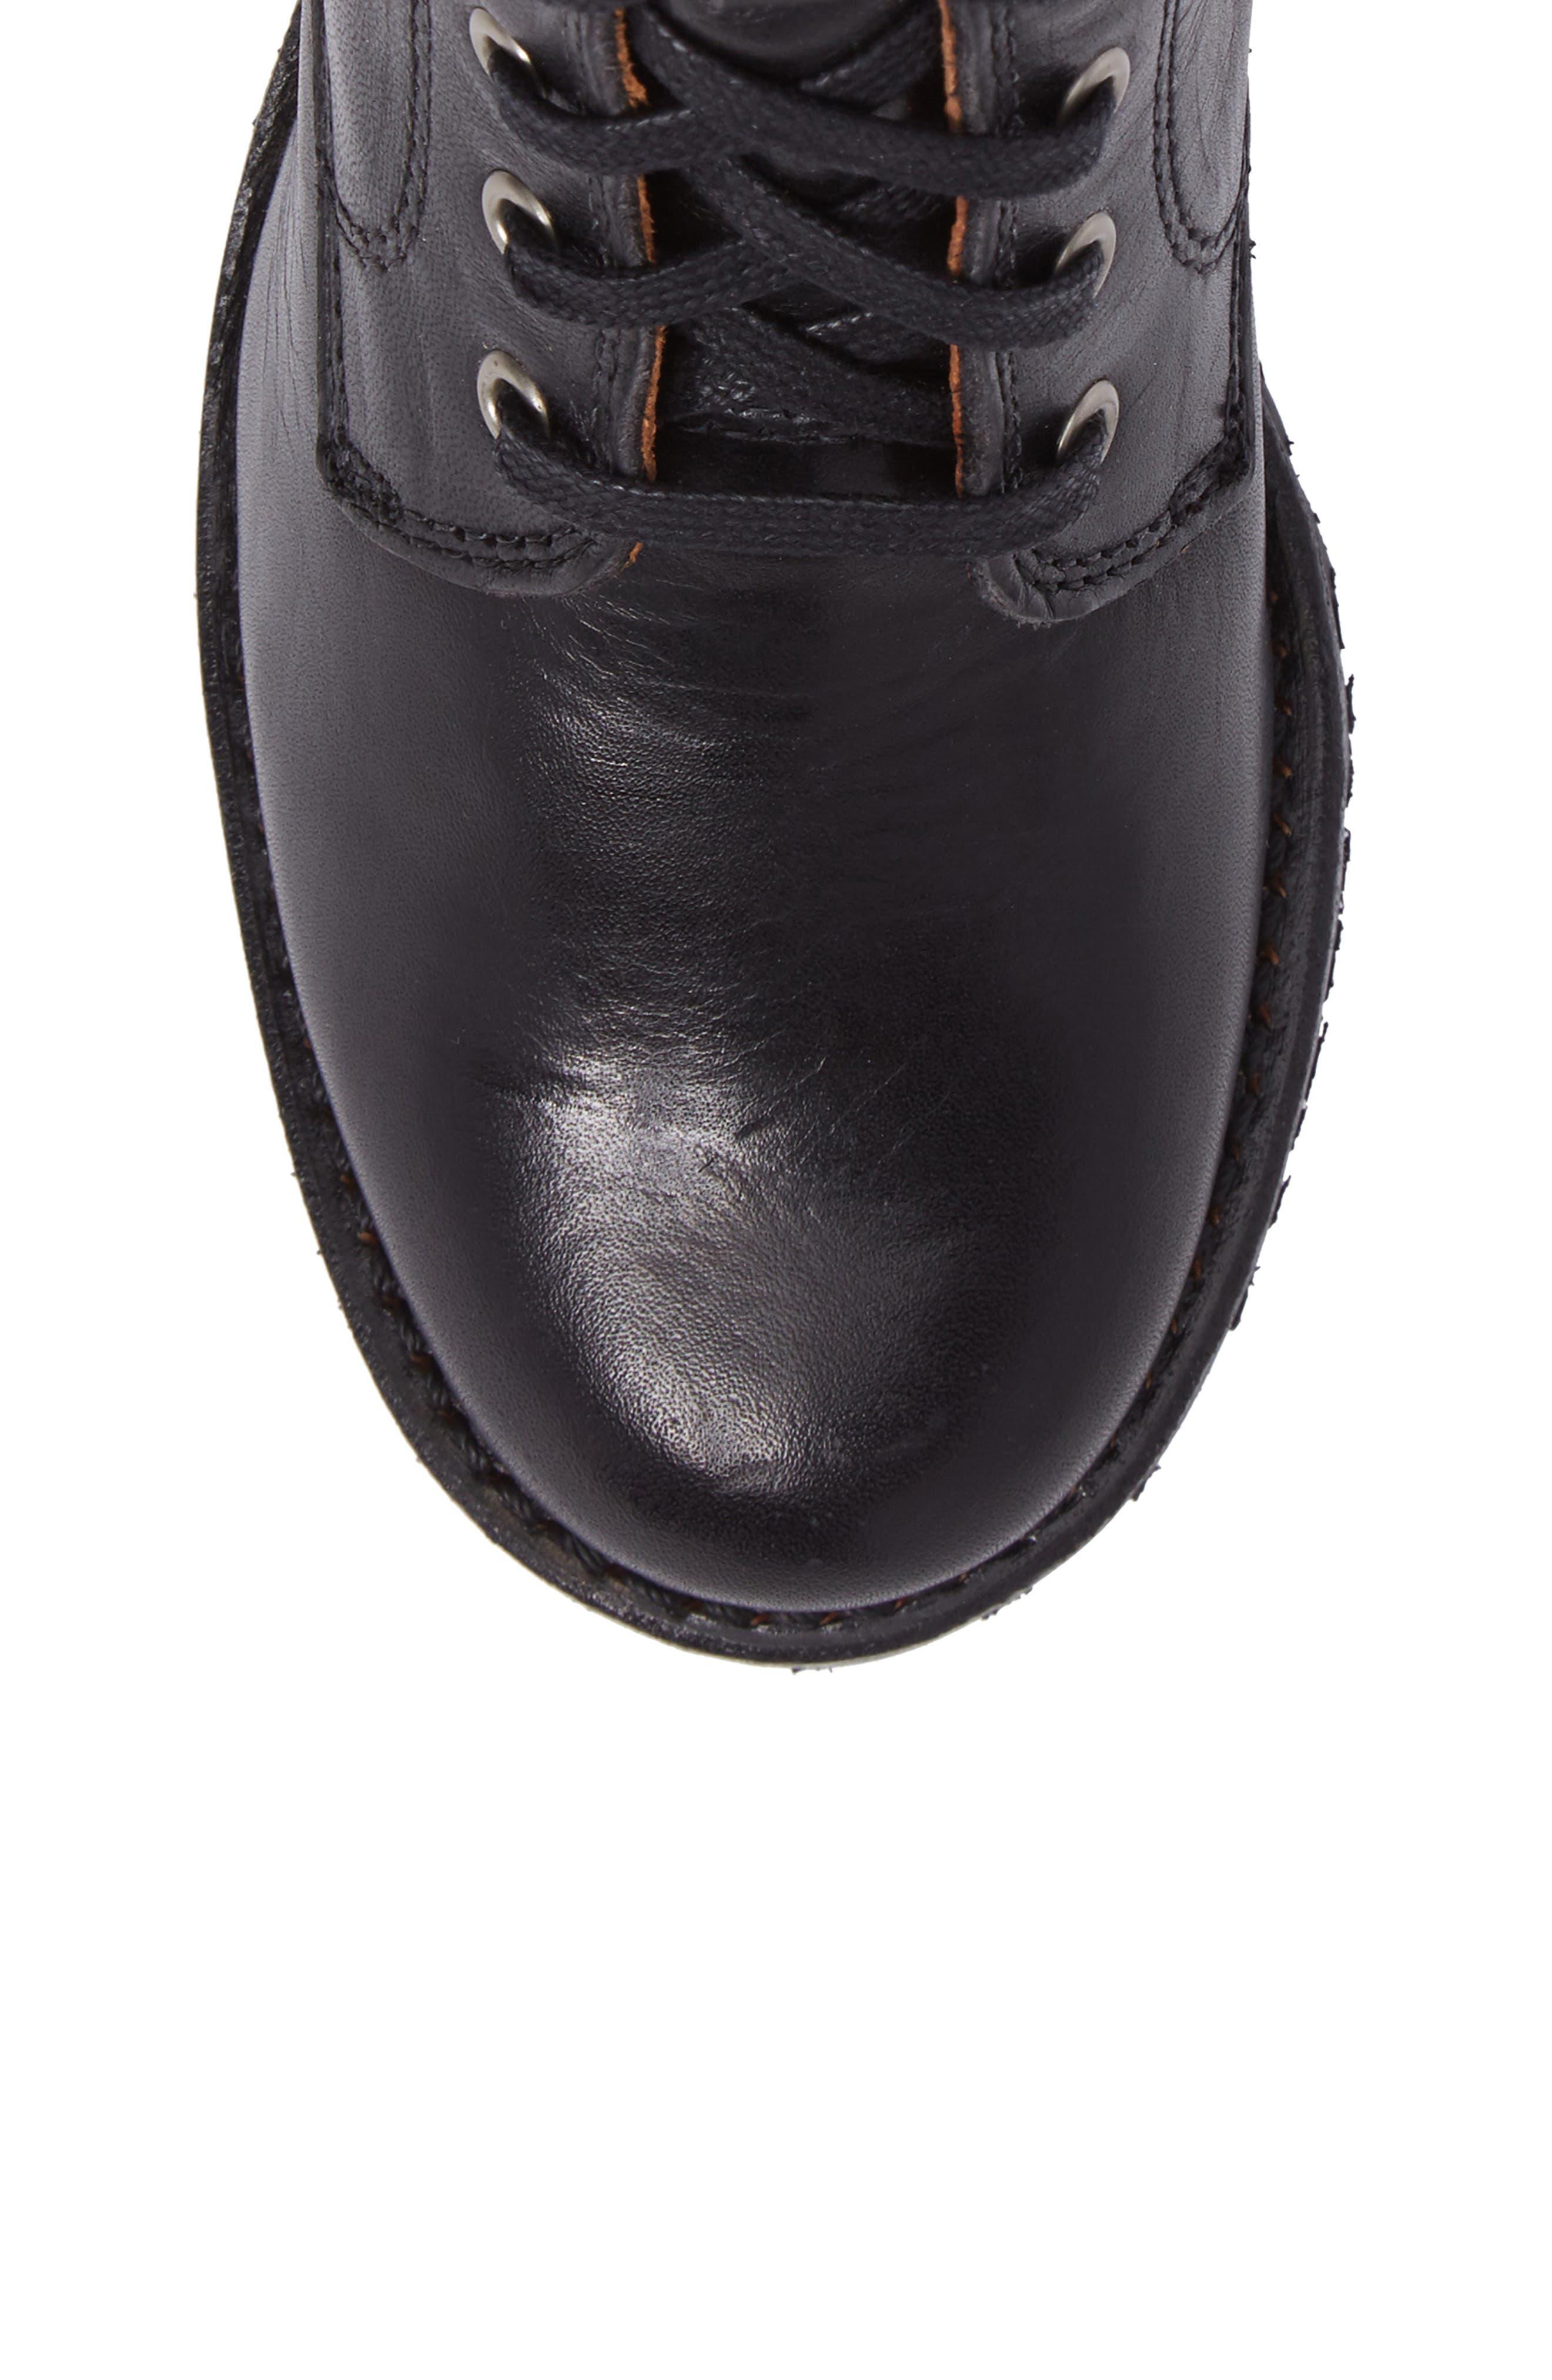 FRYE, Sabrina 6G Lace-Up Boot, Alternate thumbnail 5, color, BLACK